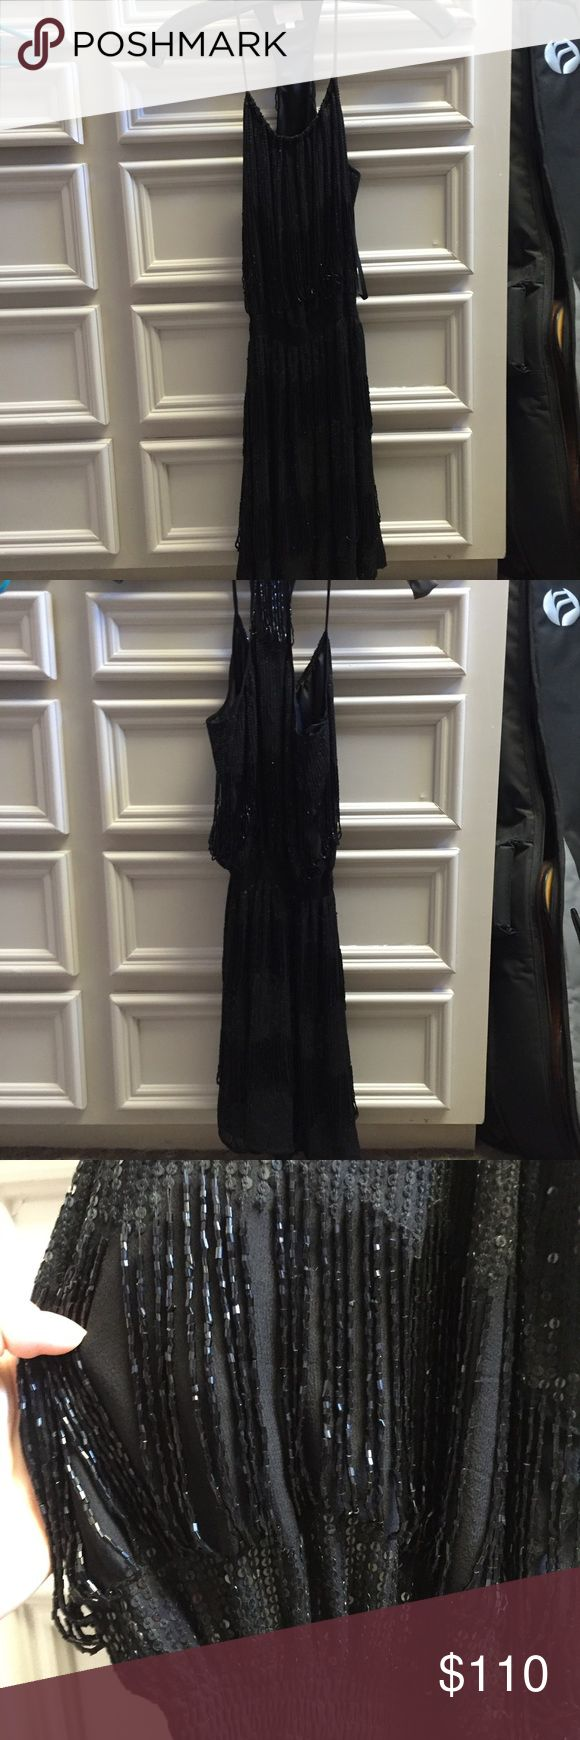 Parker NY Beaded Black Dress Never worn, basically perfect condition Parker mini dress. Parker Dresses Mini